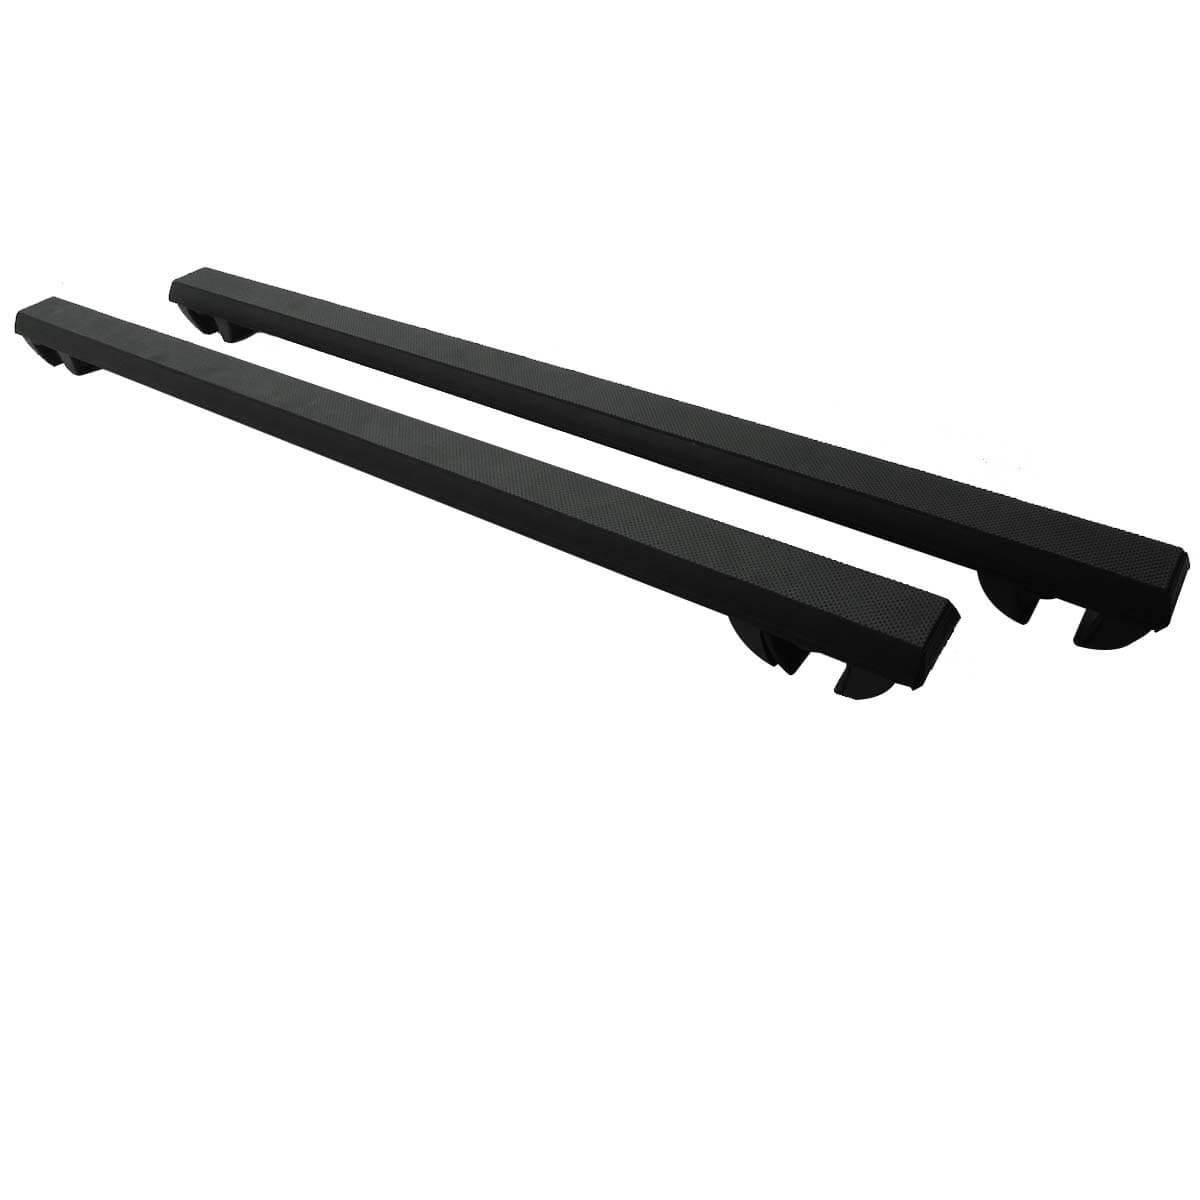 Travessa rack de teto Long Life Grip 1,20 m Alumínio Preto